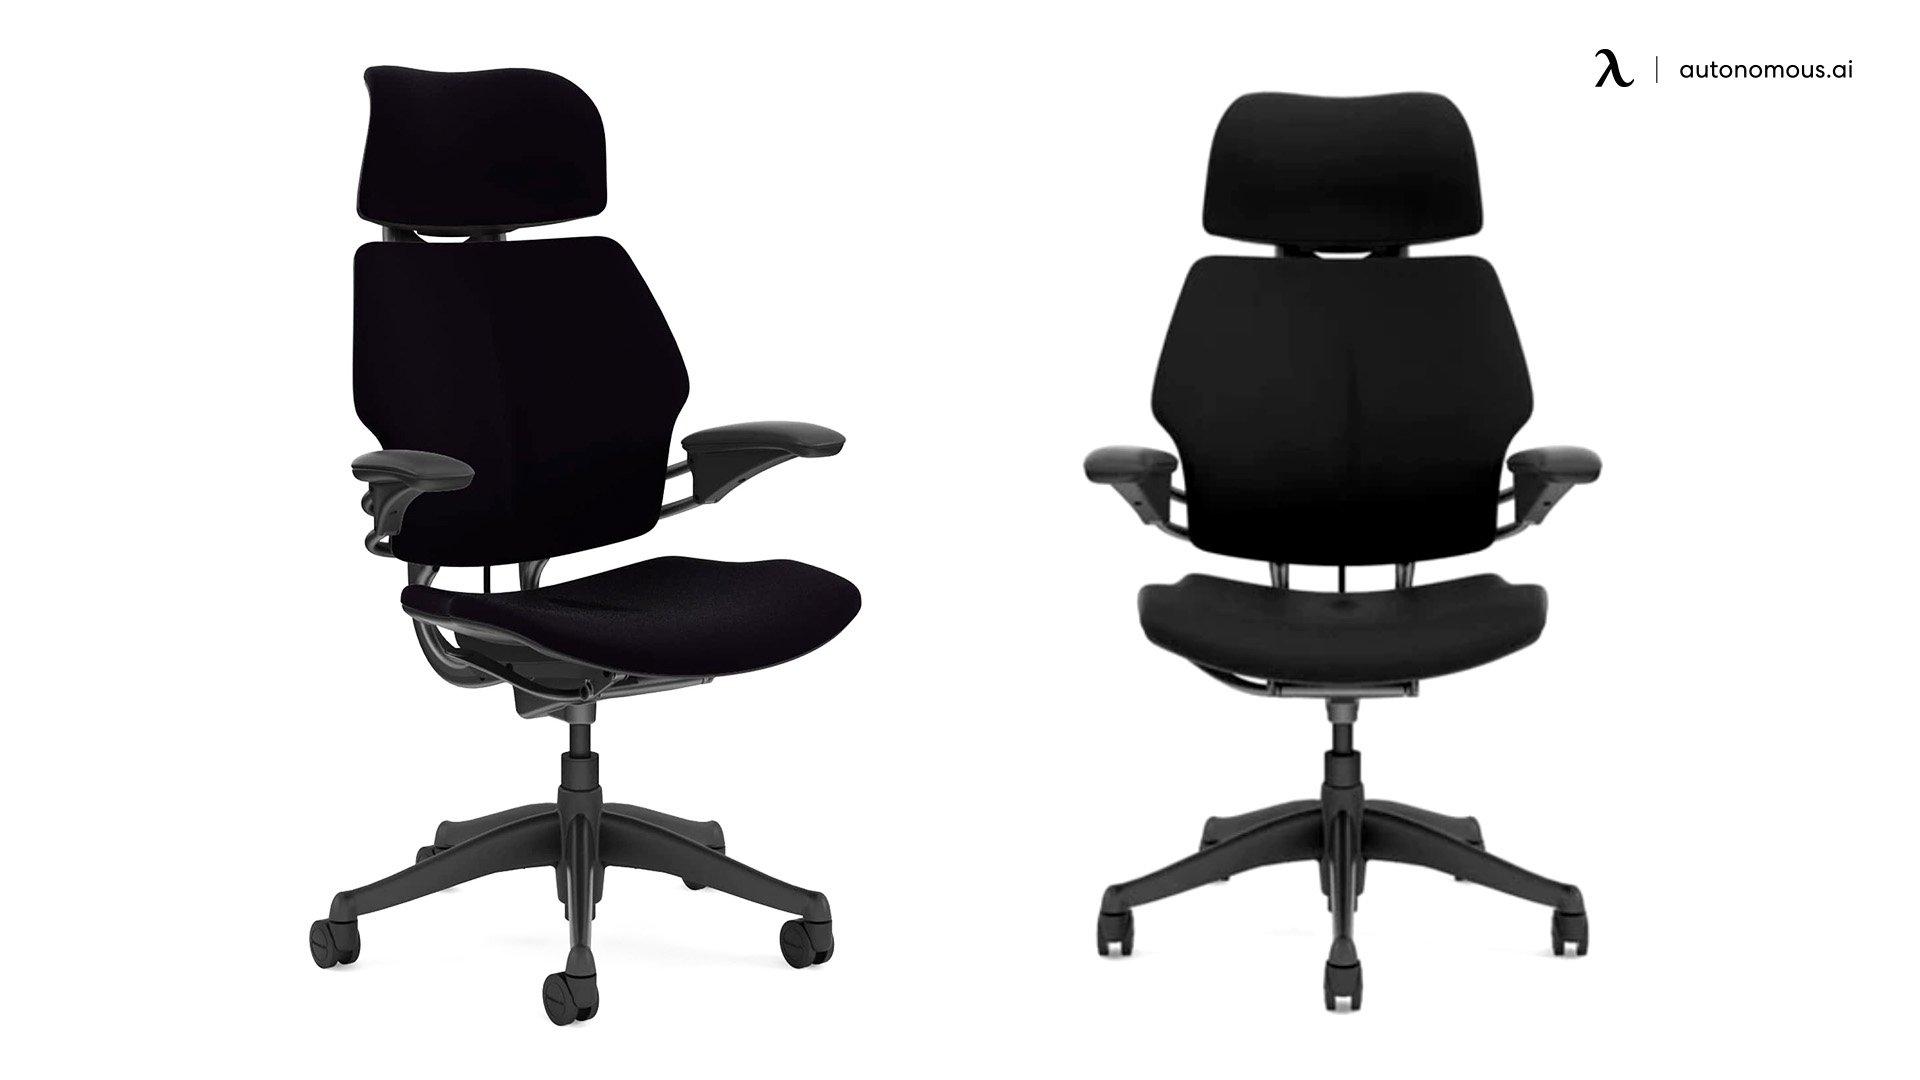 The Humanscale Freedom Headrest Chair